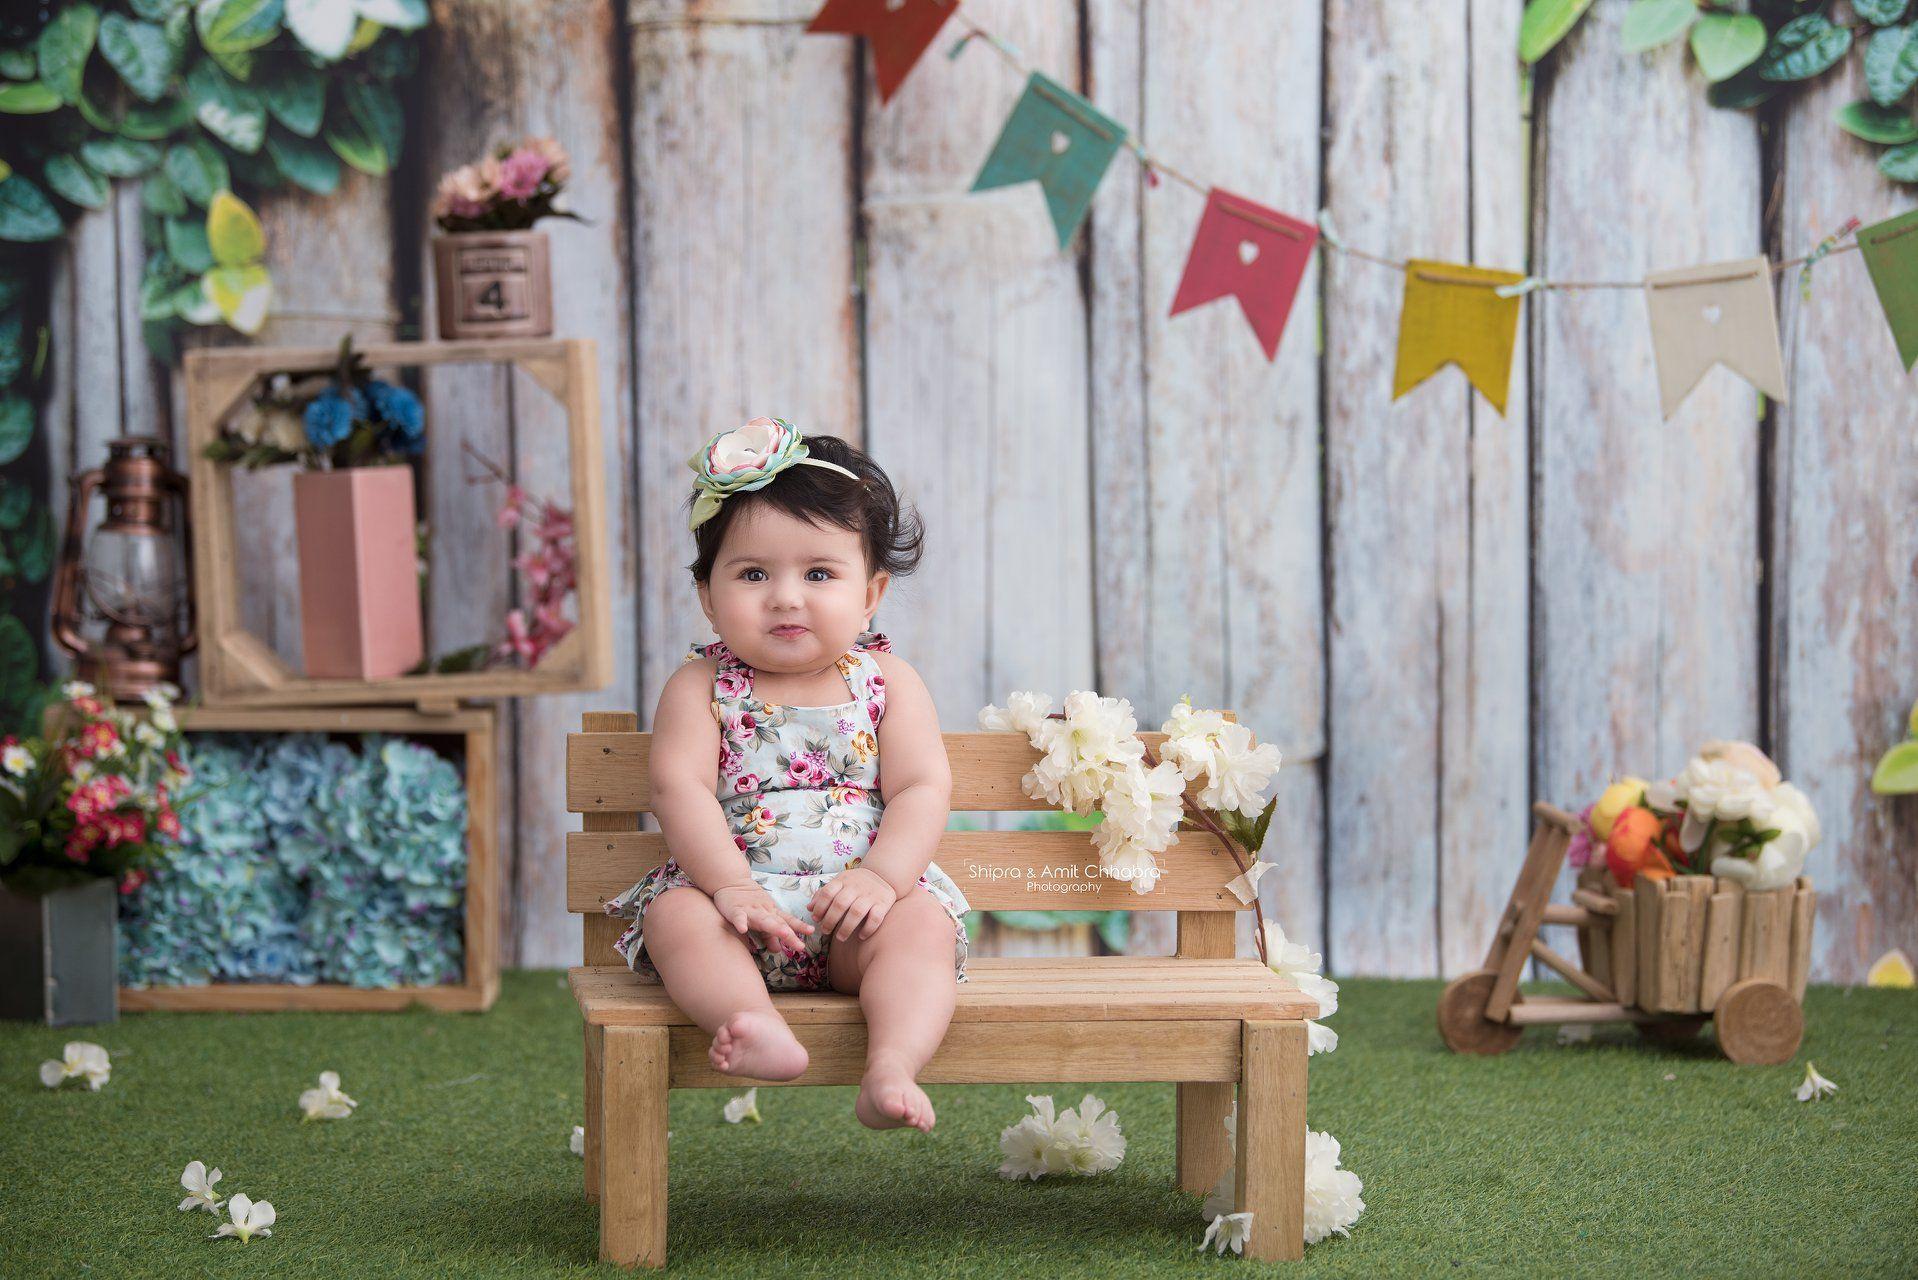 Infant photography baby photographer baby photo shoot ideas indoor photoshoot baby girl photo shoot shipra amit chhabra photography